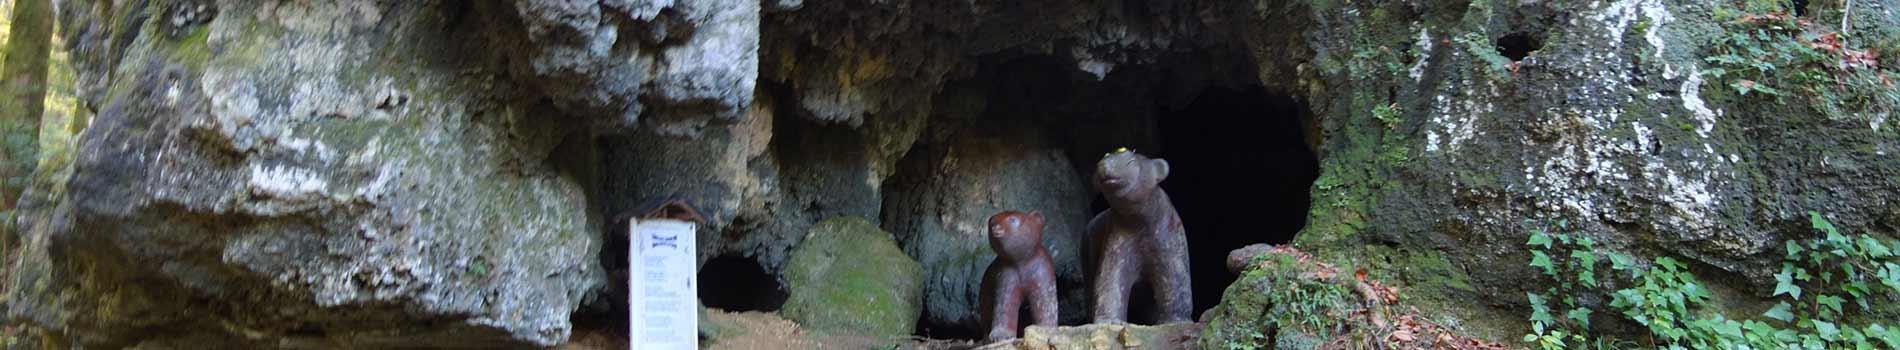 grotte de maxange